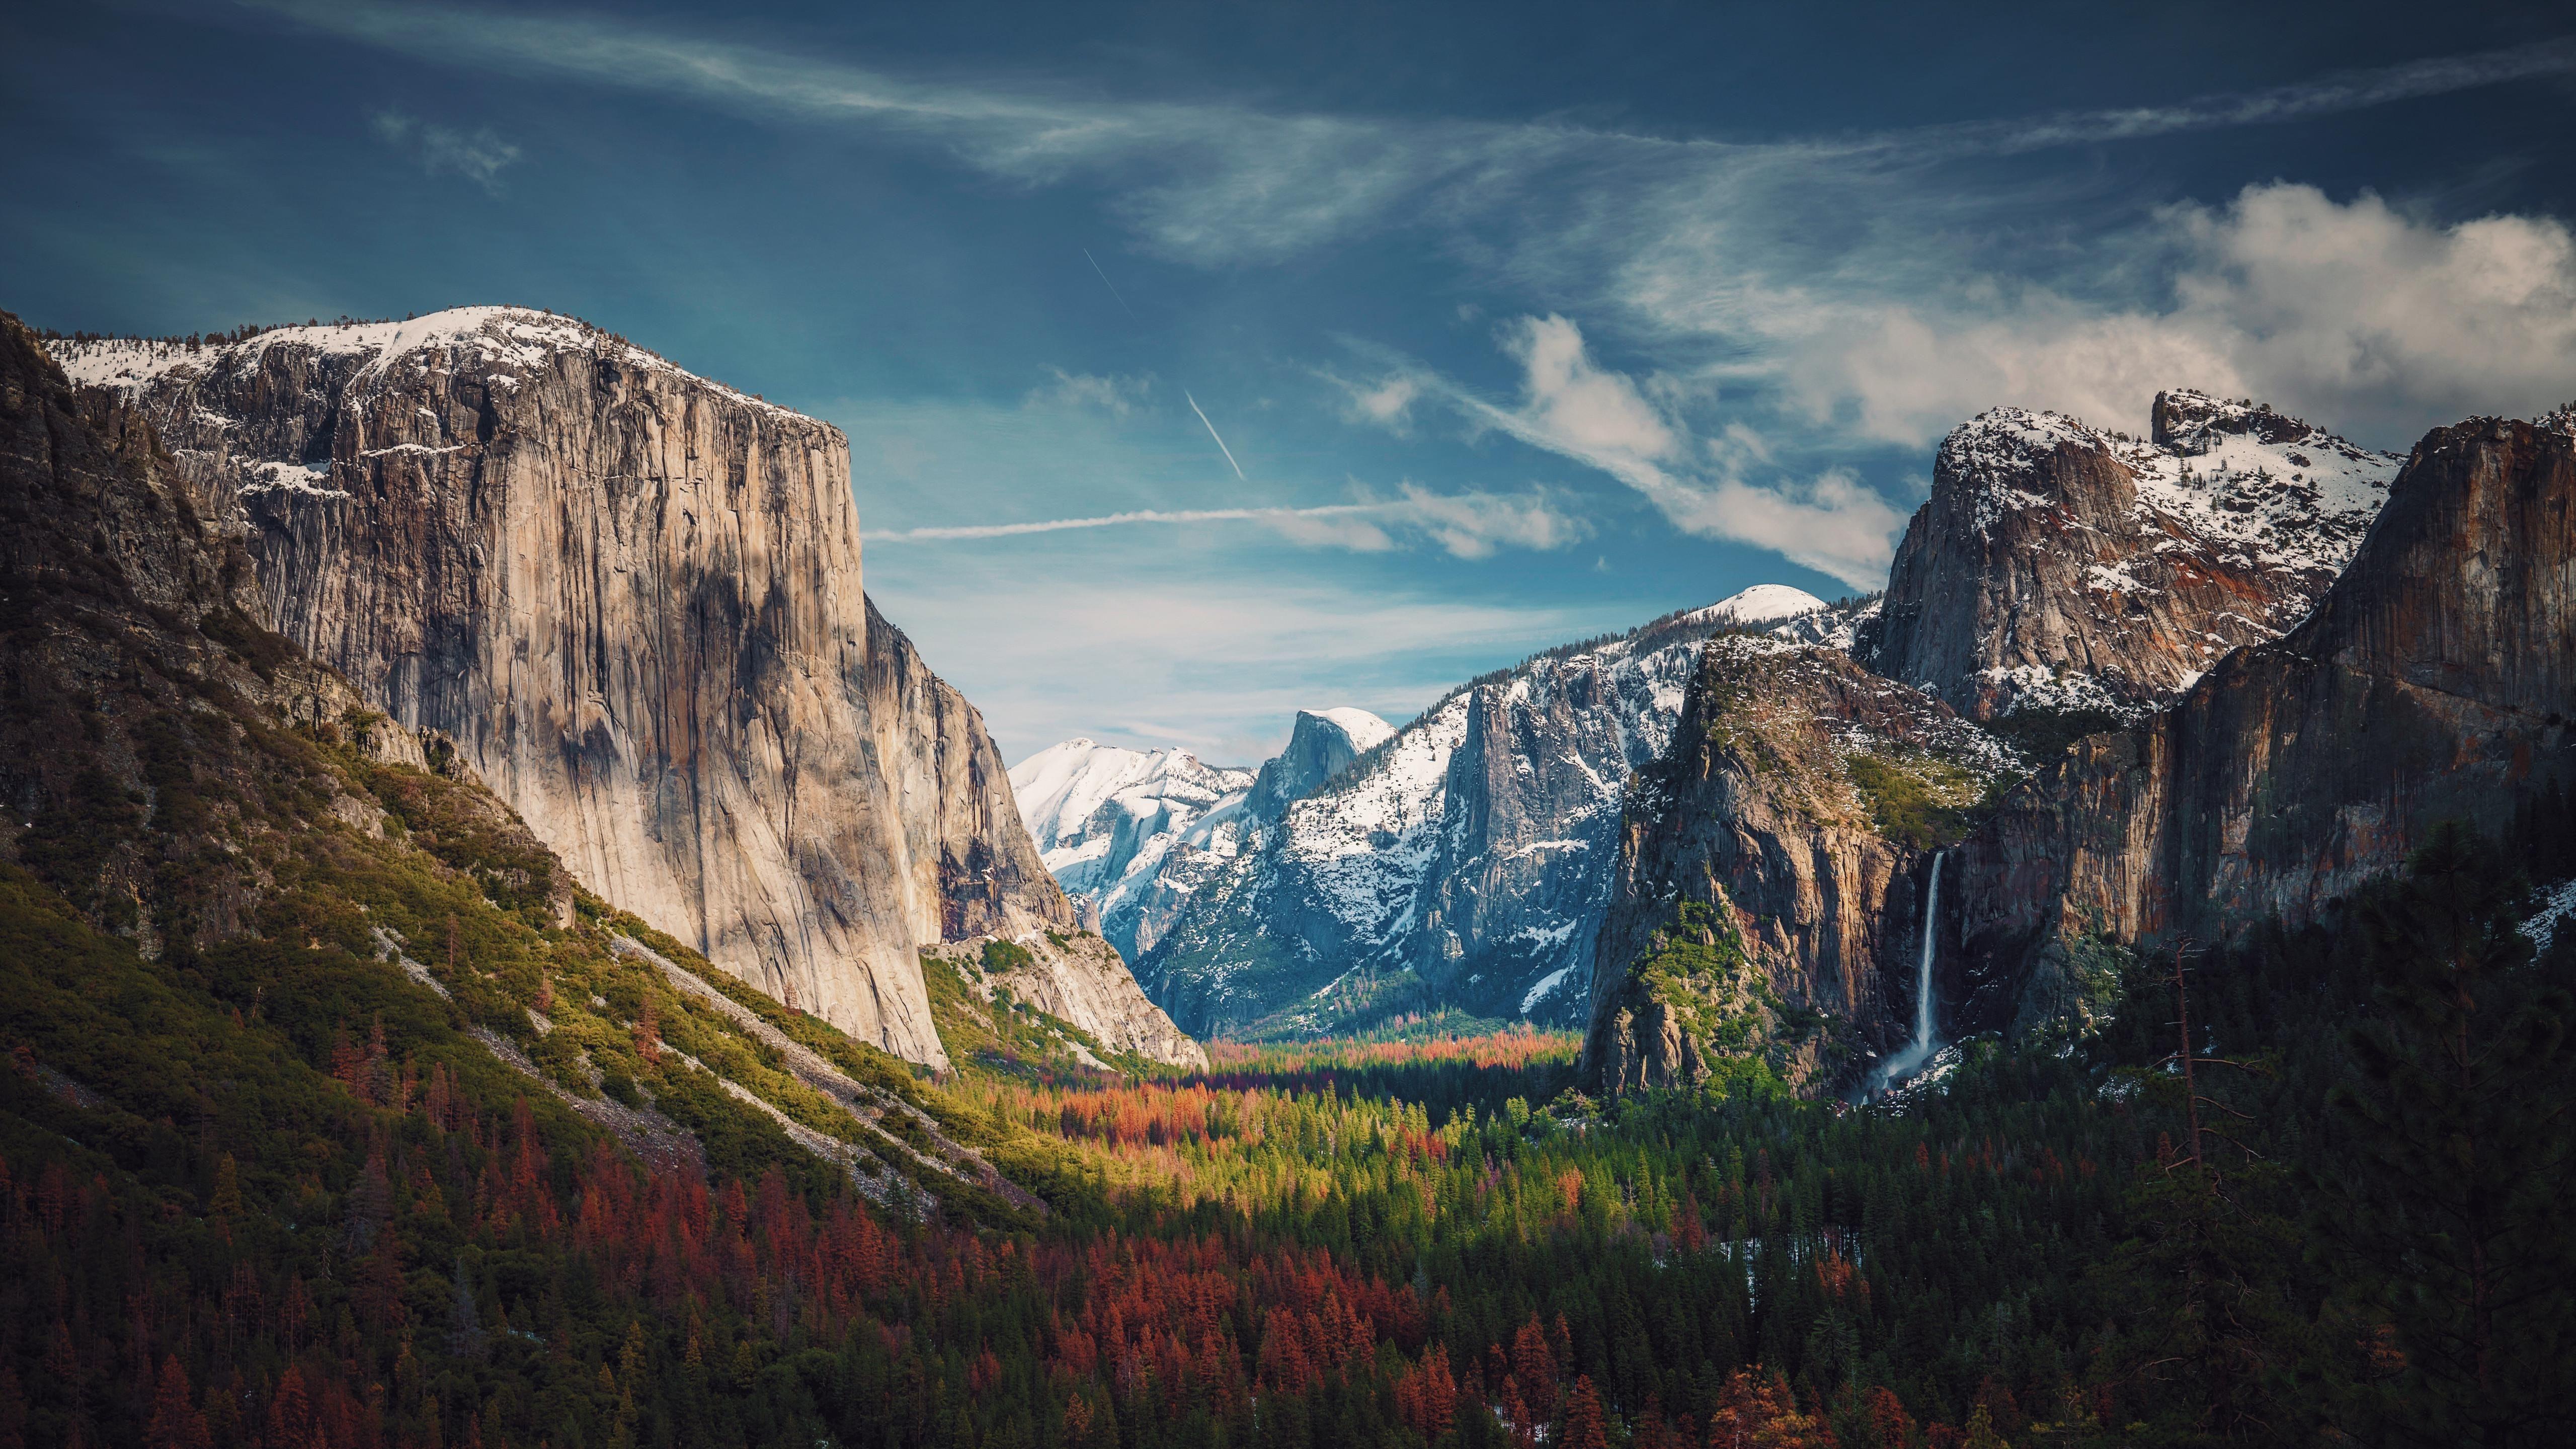 #[51202880] Yosemite Valley by Aniket Deole on Unsplash. #Hdwallpaper # wallpaper #image